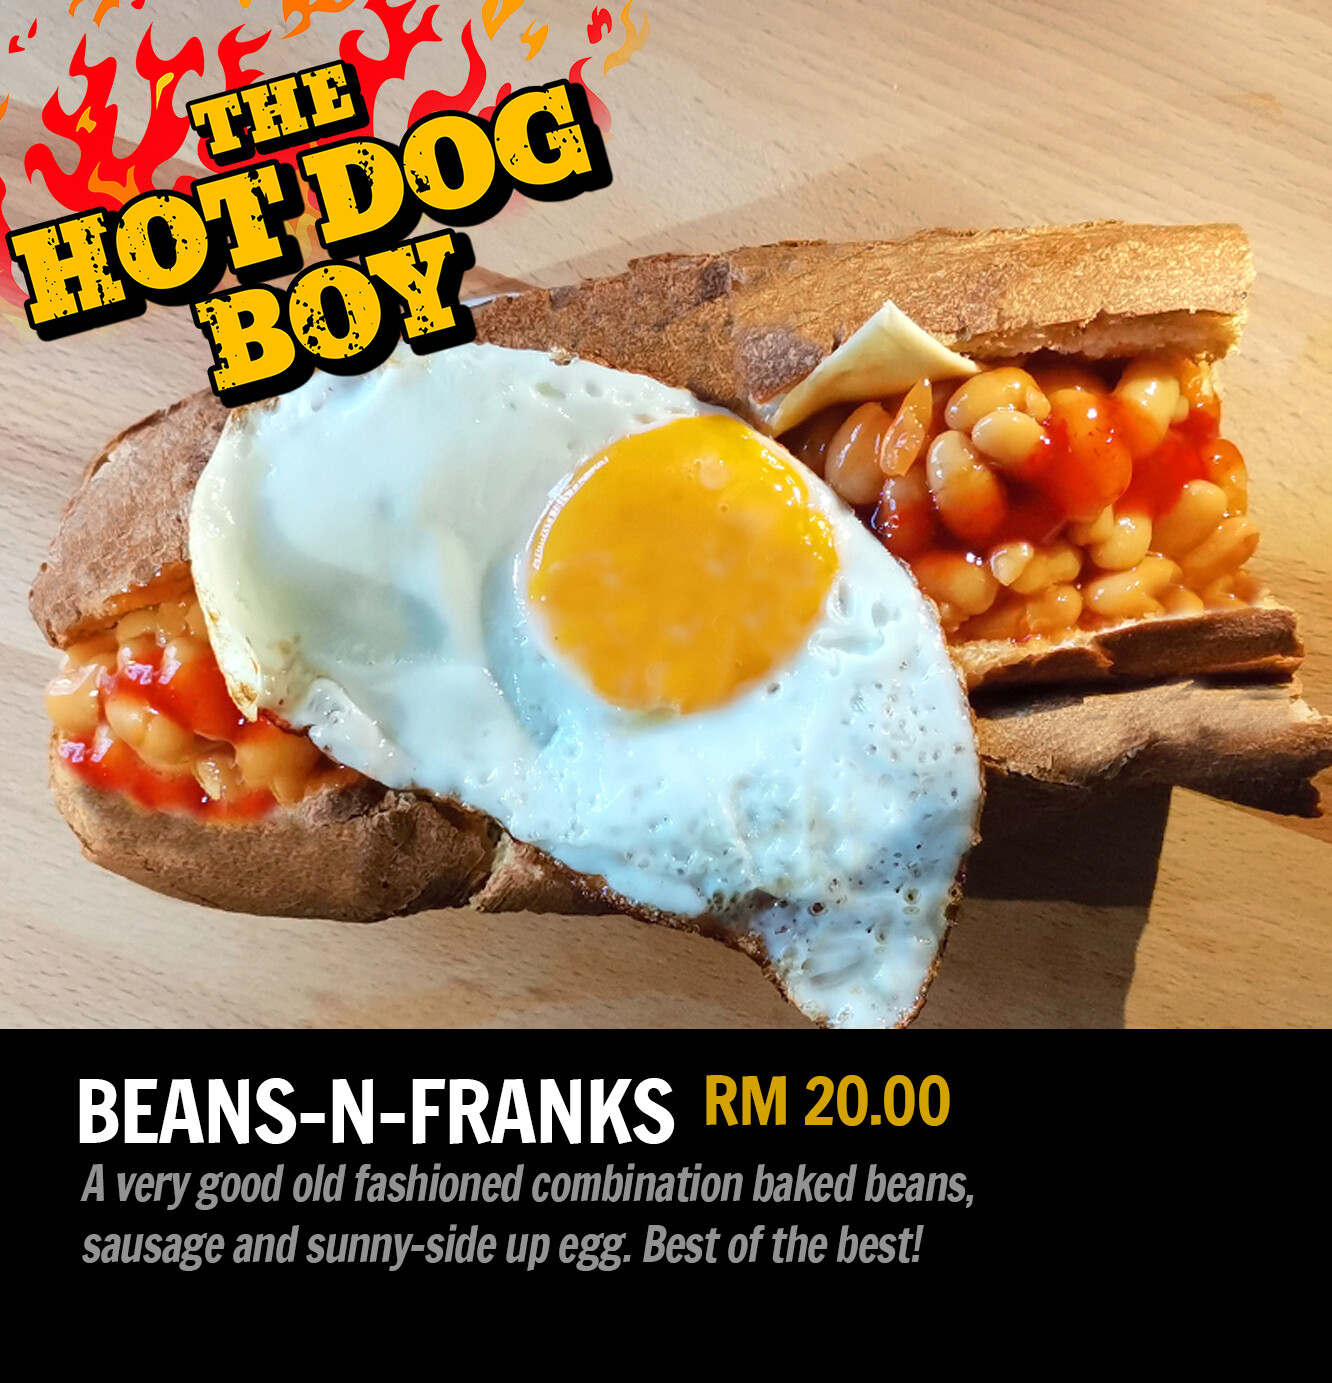 Beans-n-Franks